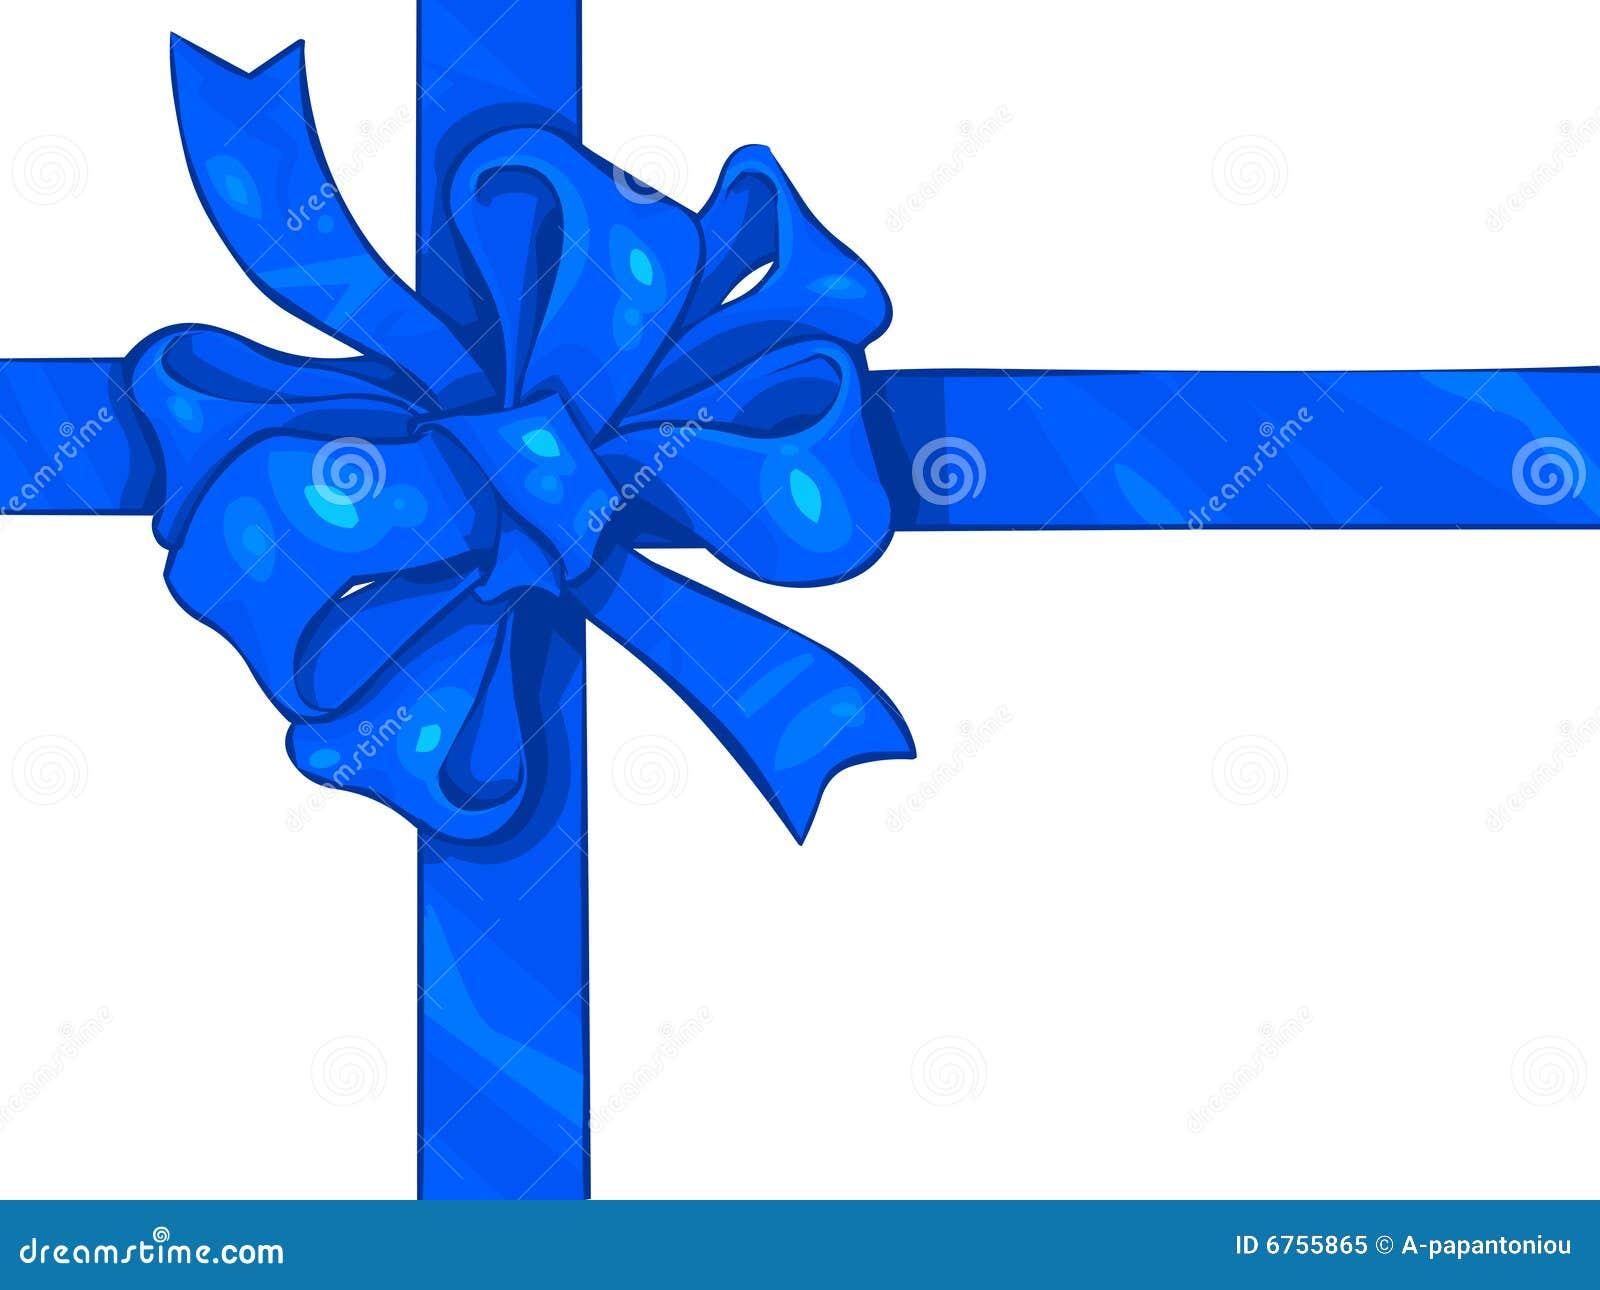 Blue Ribbon Bow Royalty Free Stock Photo - Image: 6755865